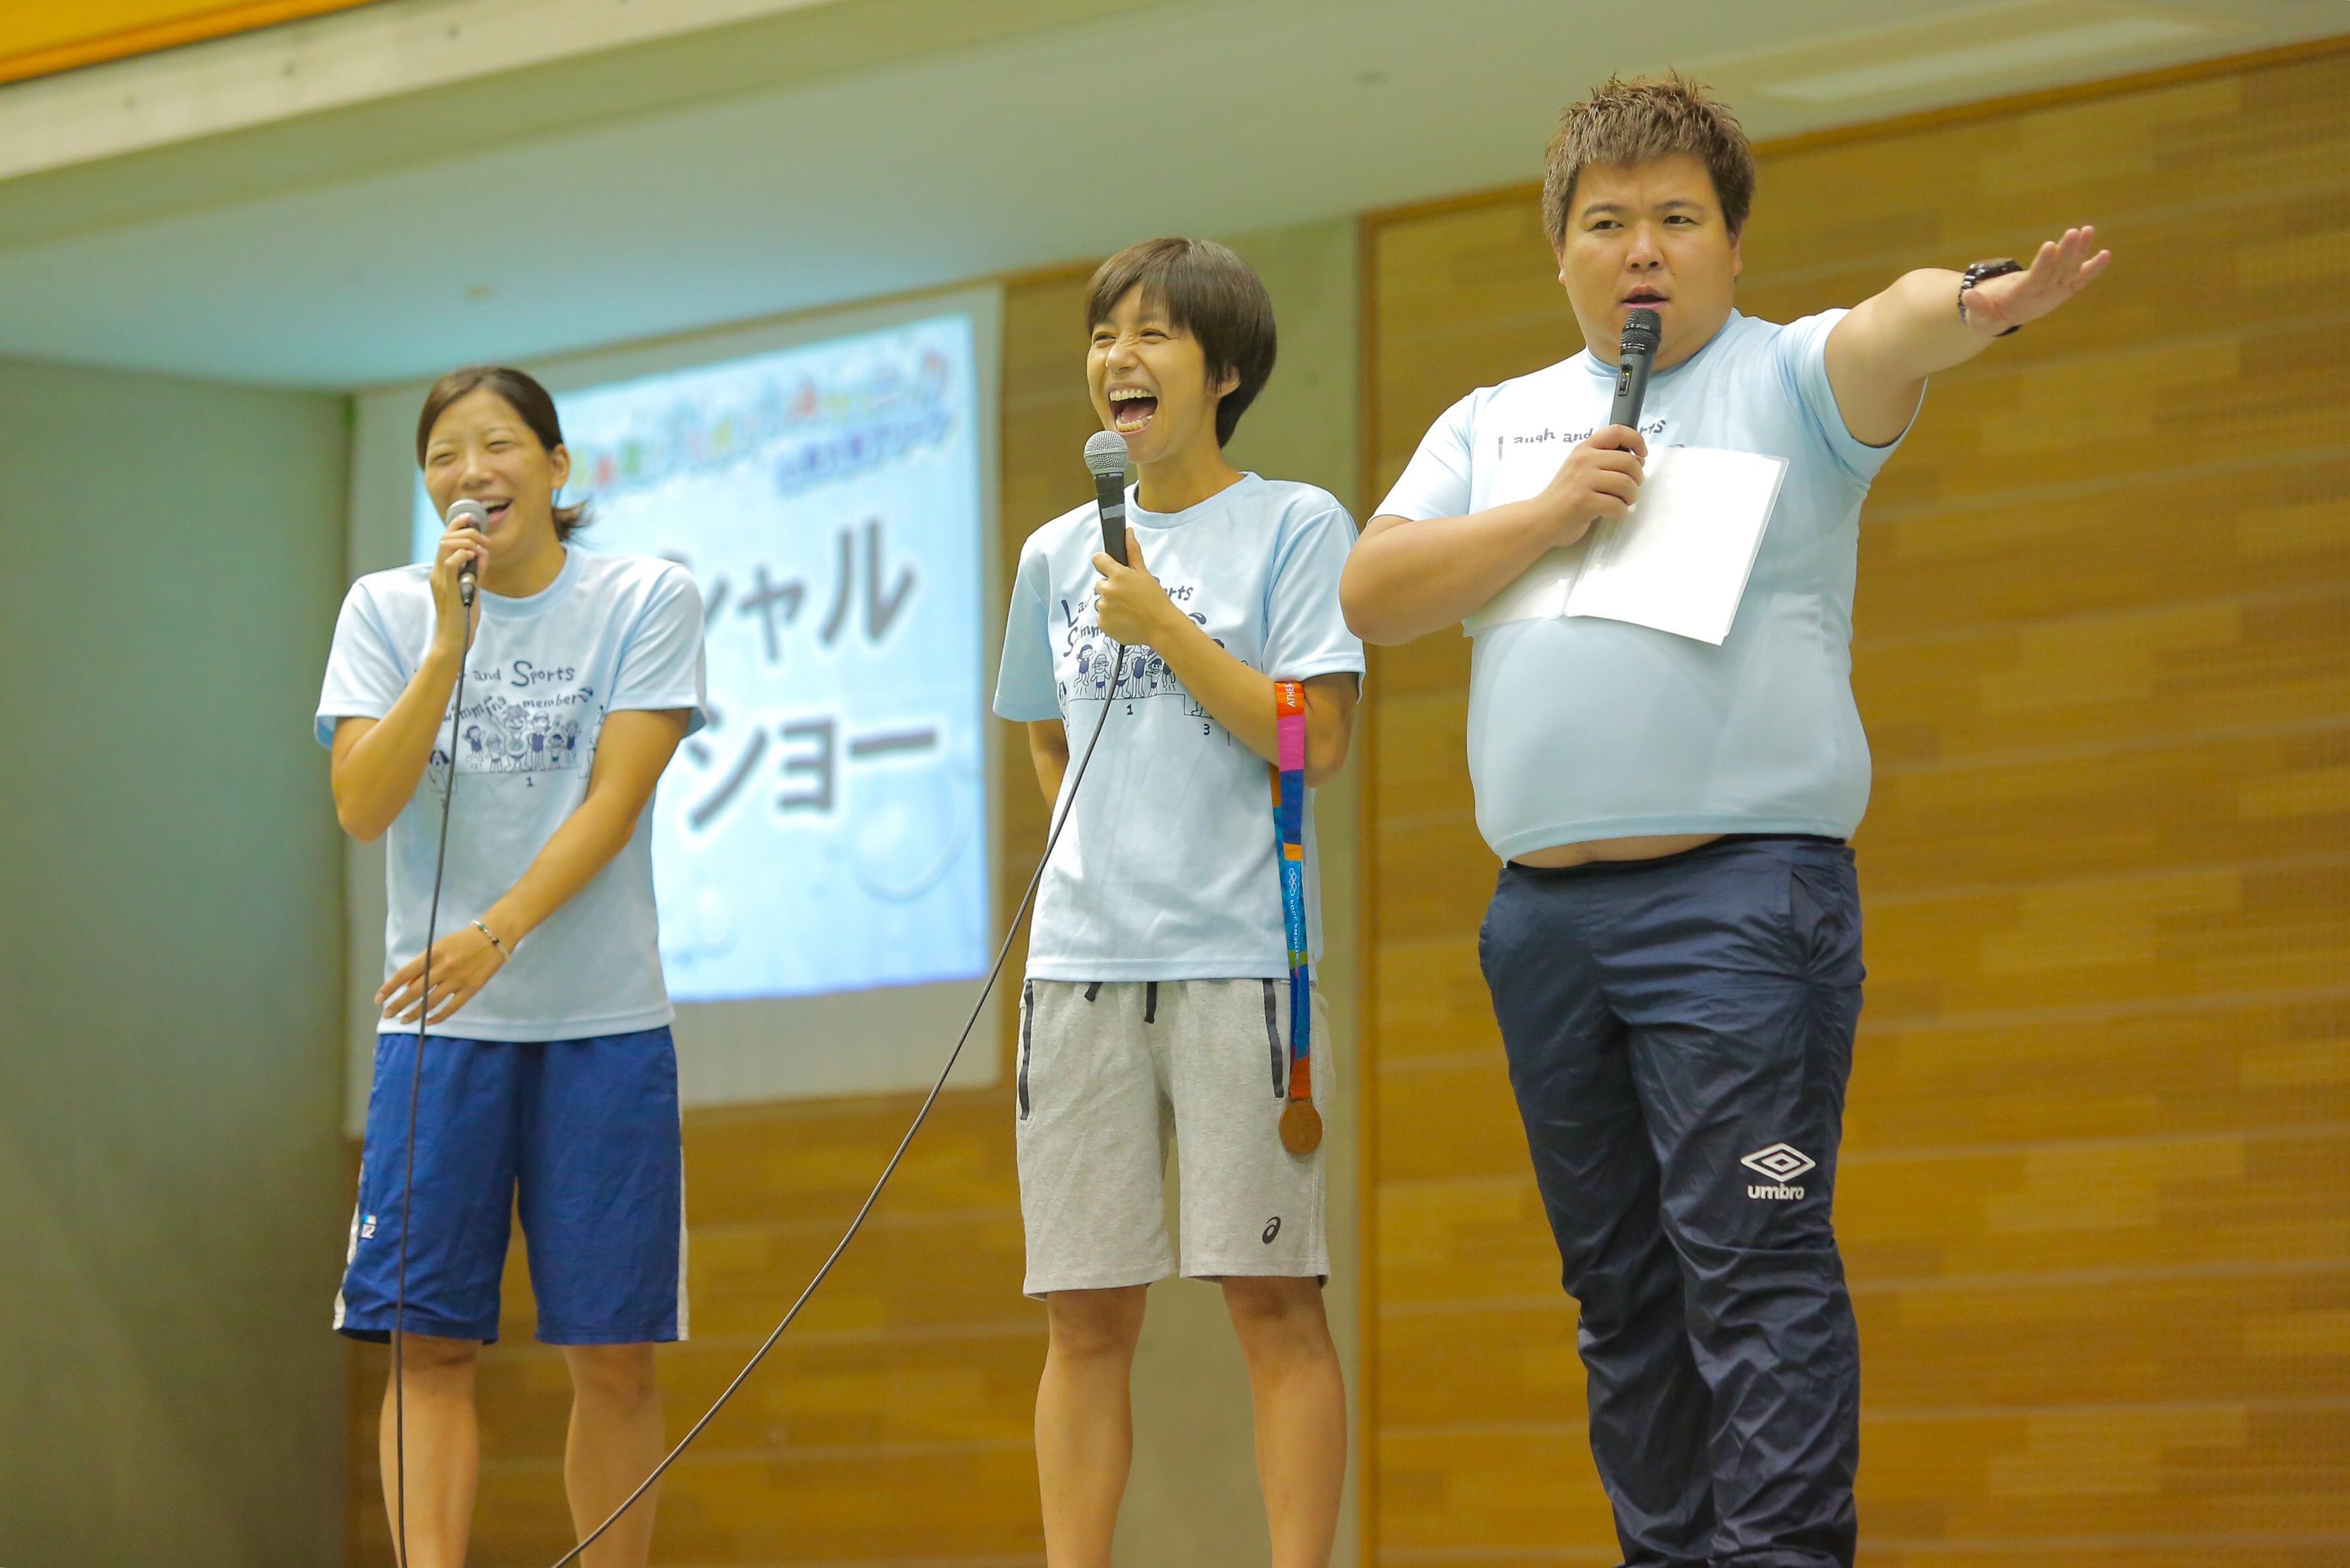 http://news.yoshimoto.co.jp/20171001211916-dce0247dd9afe5b26de8807836d4bf5e50484f7f.jpg